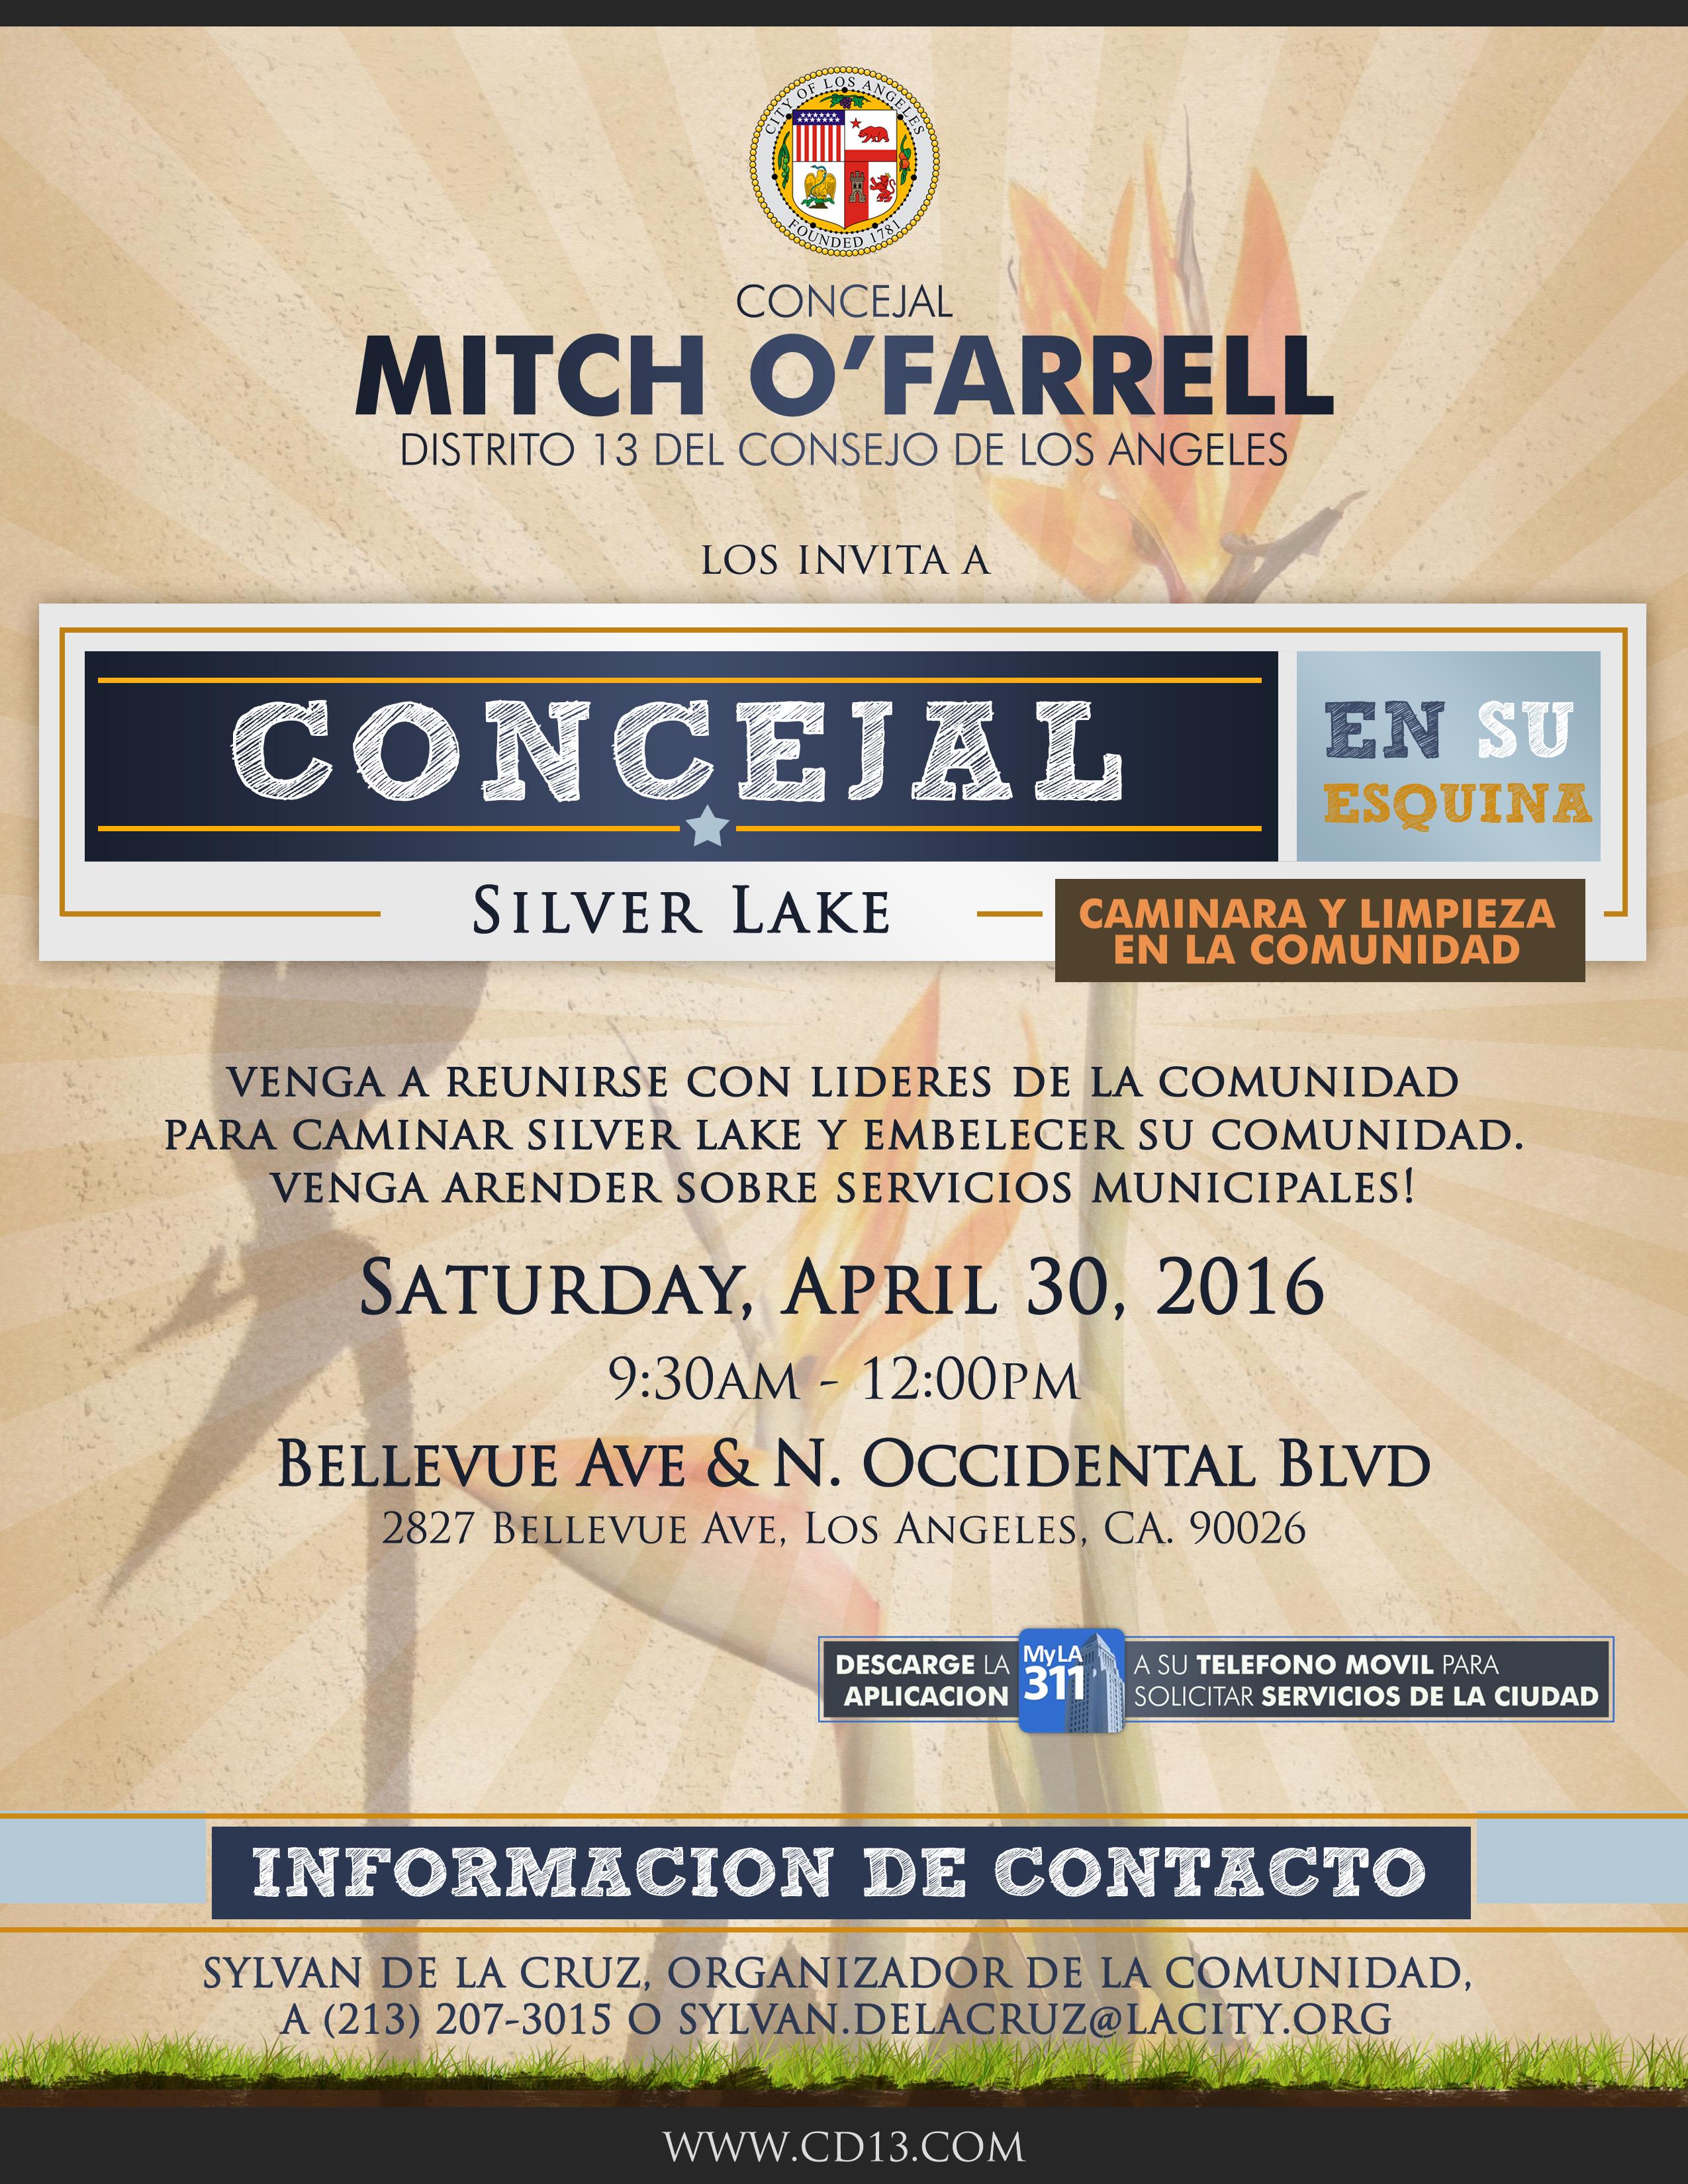 Councilmember_In_Your_Corner_(April_2016)_Spanish.jpg